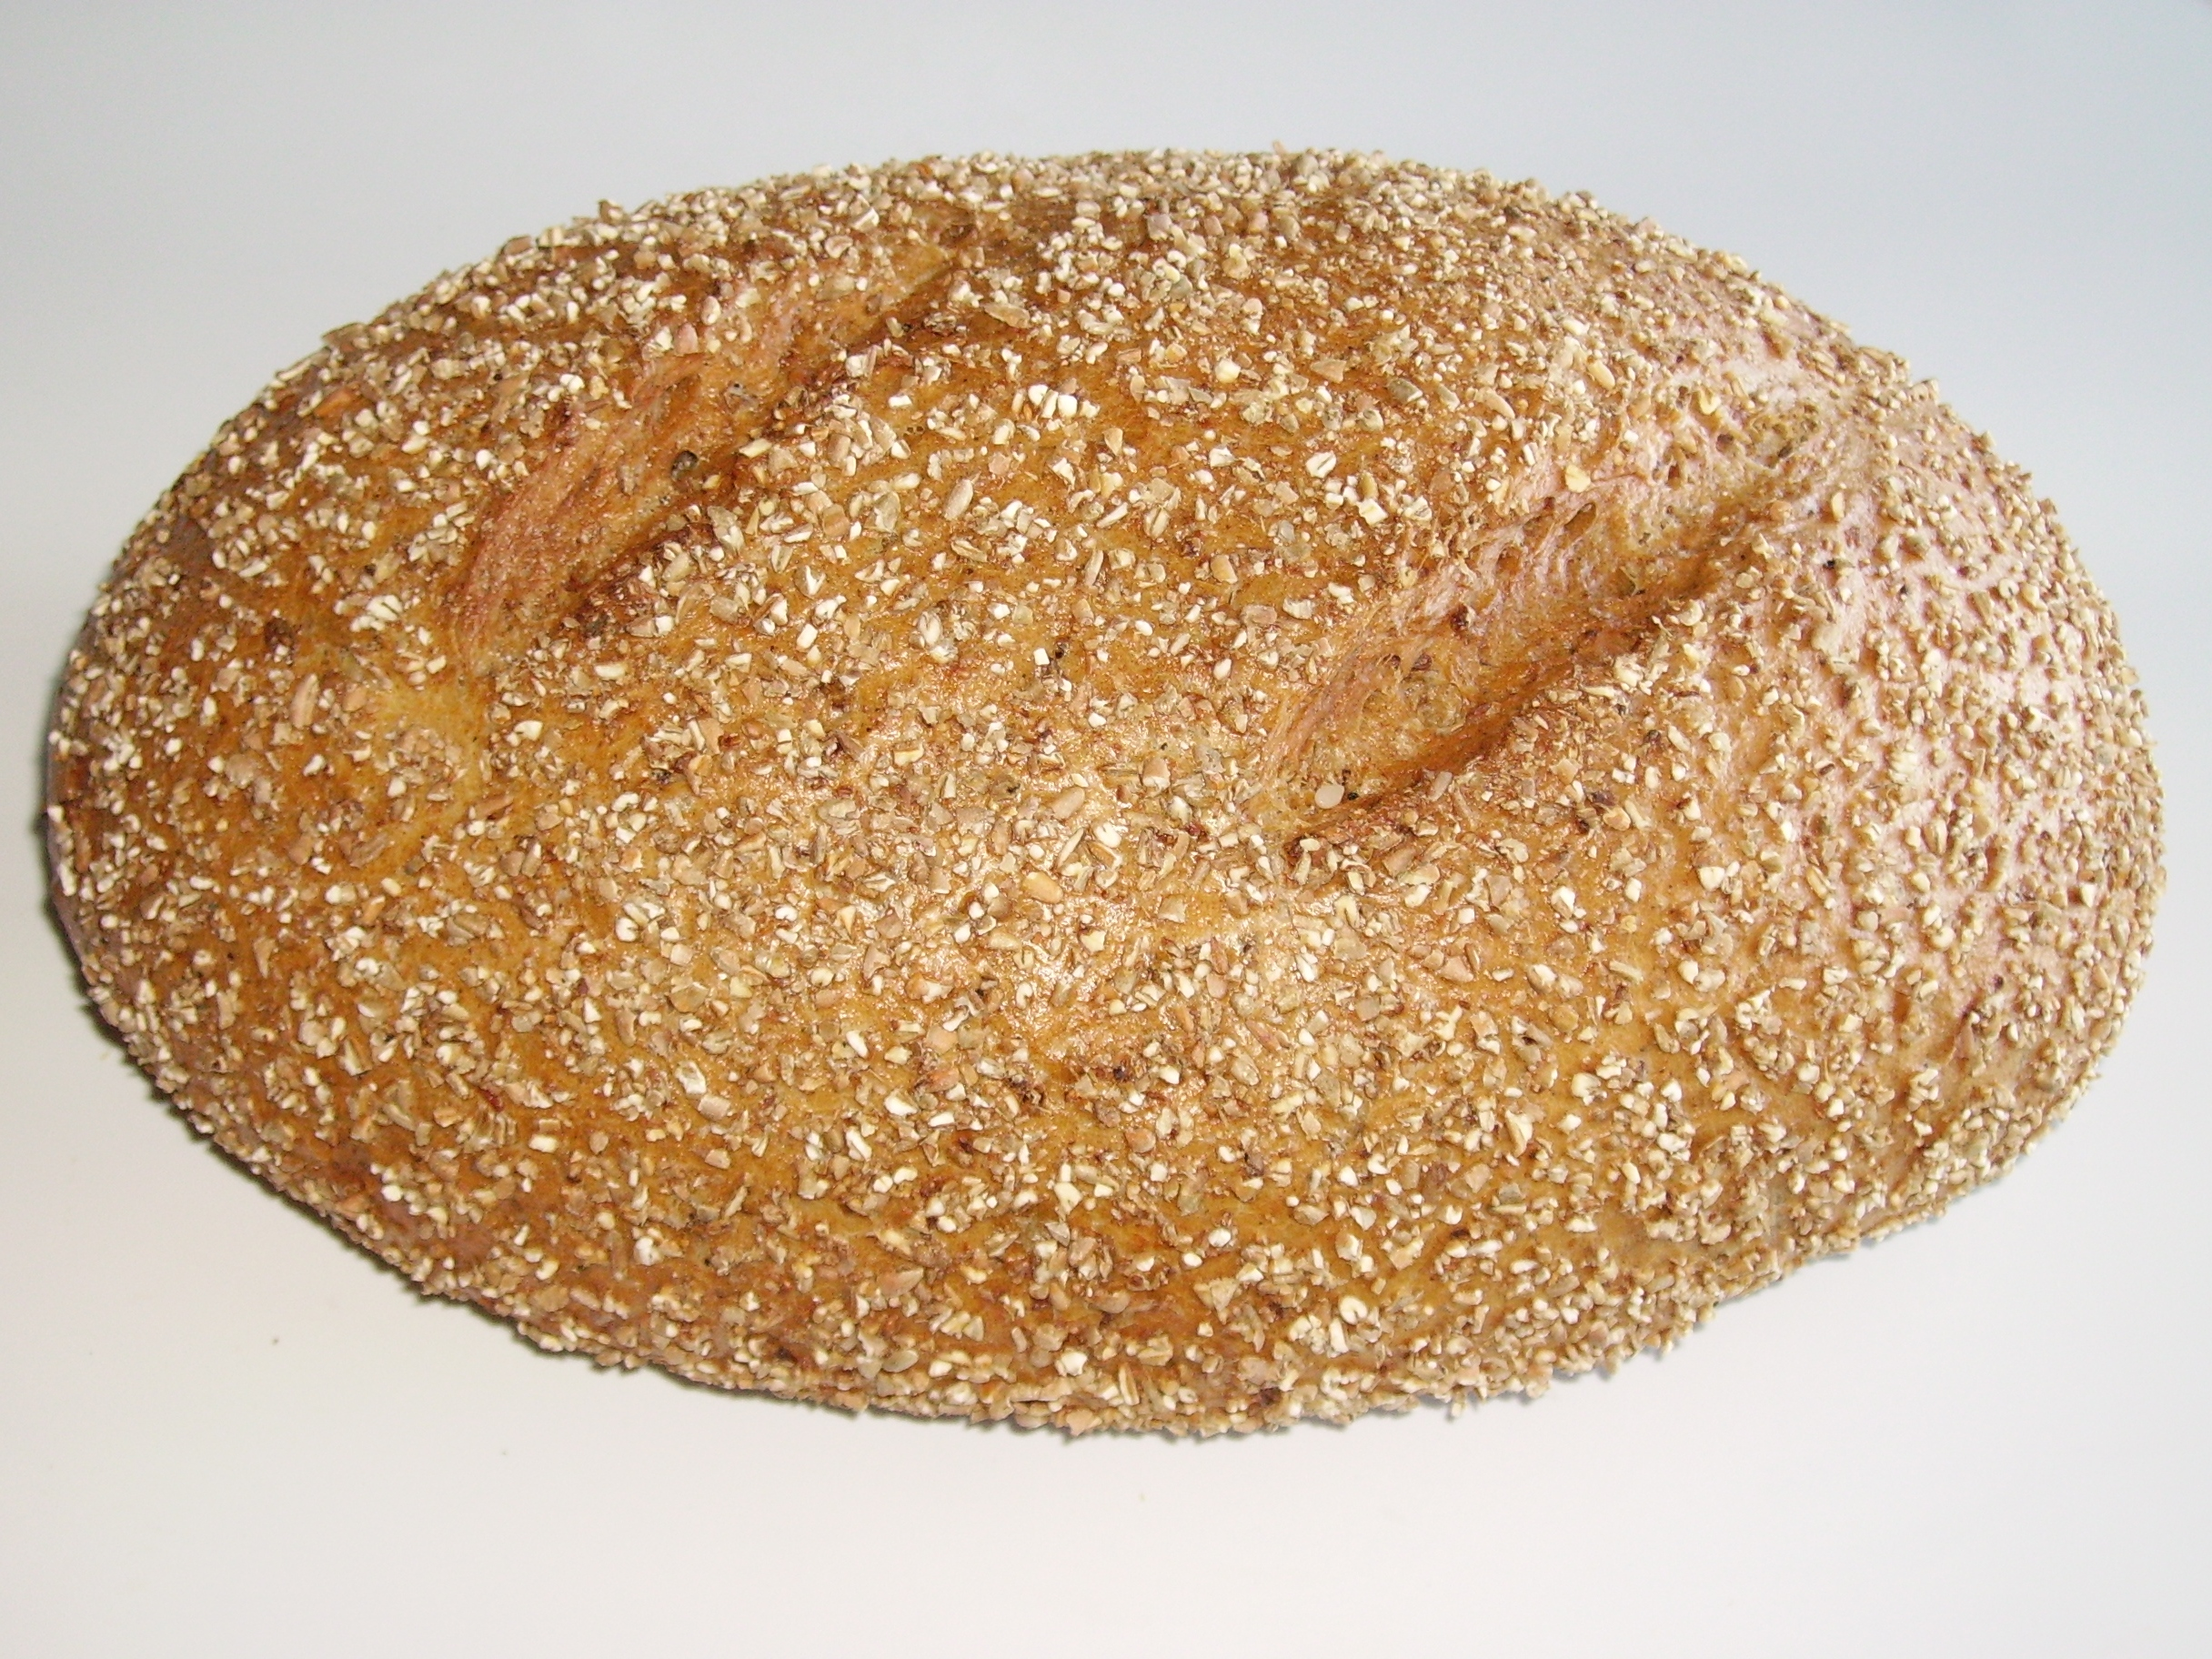 Bild eines Brotes, By Garitzko (Own work) [Public domain], via Wikimedia Commons